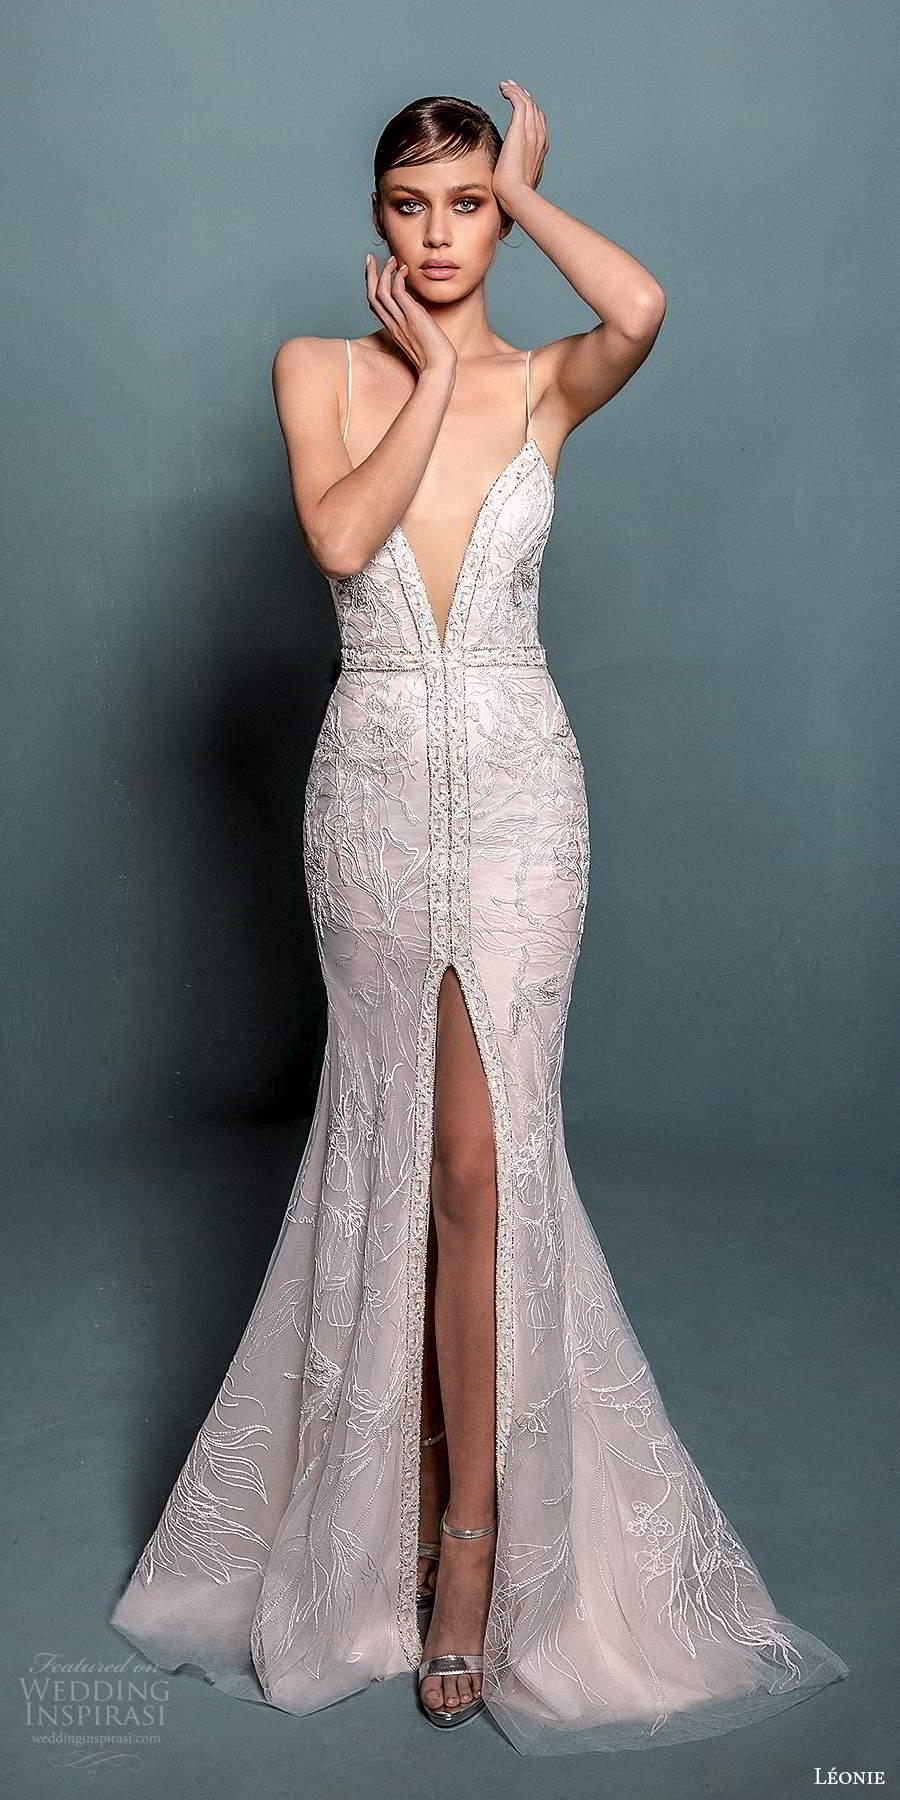 leonie bridal 2020 bridal sleeveless thin straps plunging v neckline embellished fit flare mermaid wedding dress slit skirt chapel train (1) mv